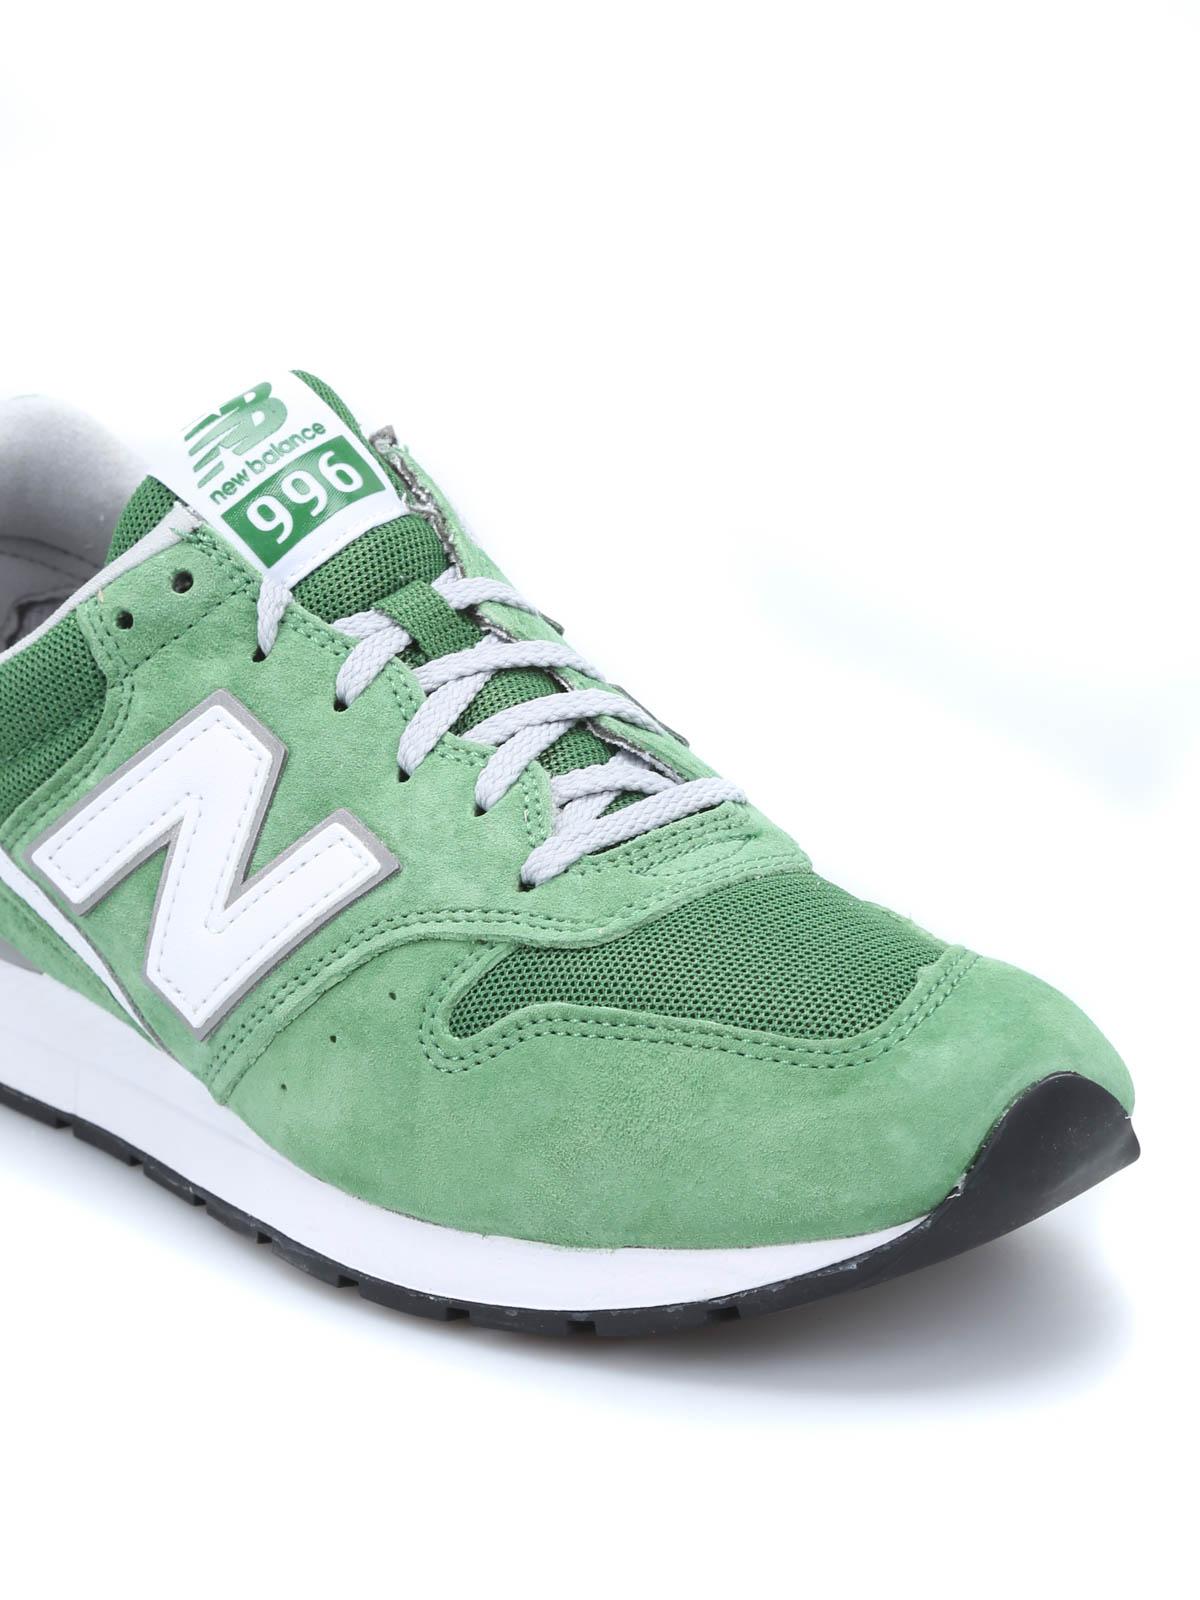 996 new balance verde